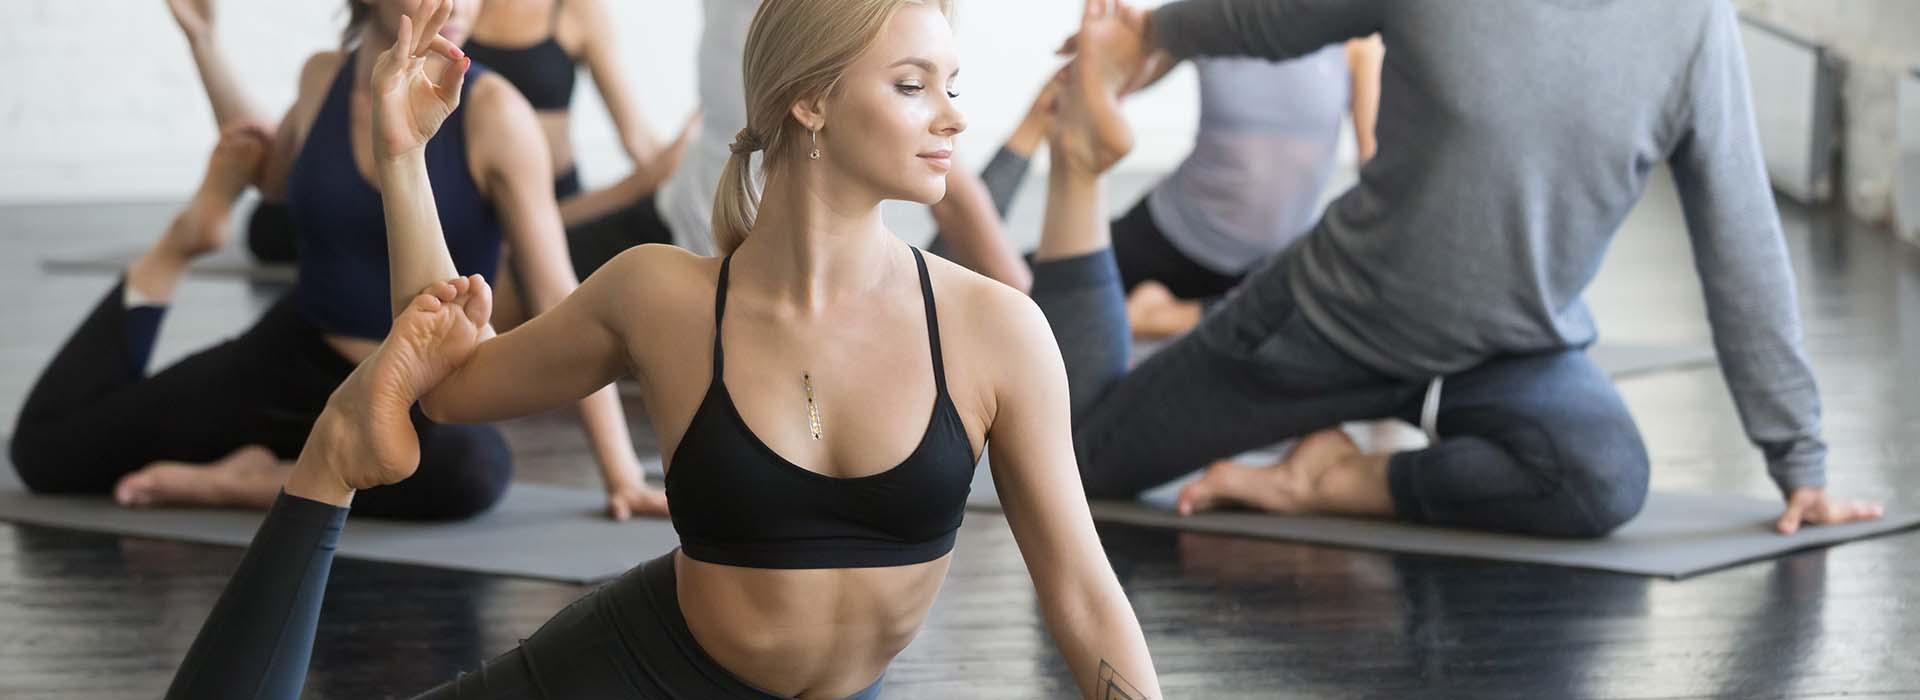 Groupfitness-Gruppe im Gesundheitskurs Yoga und Meditation